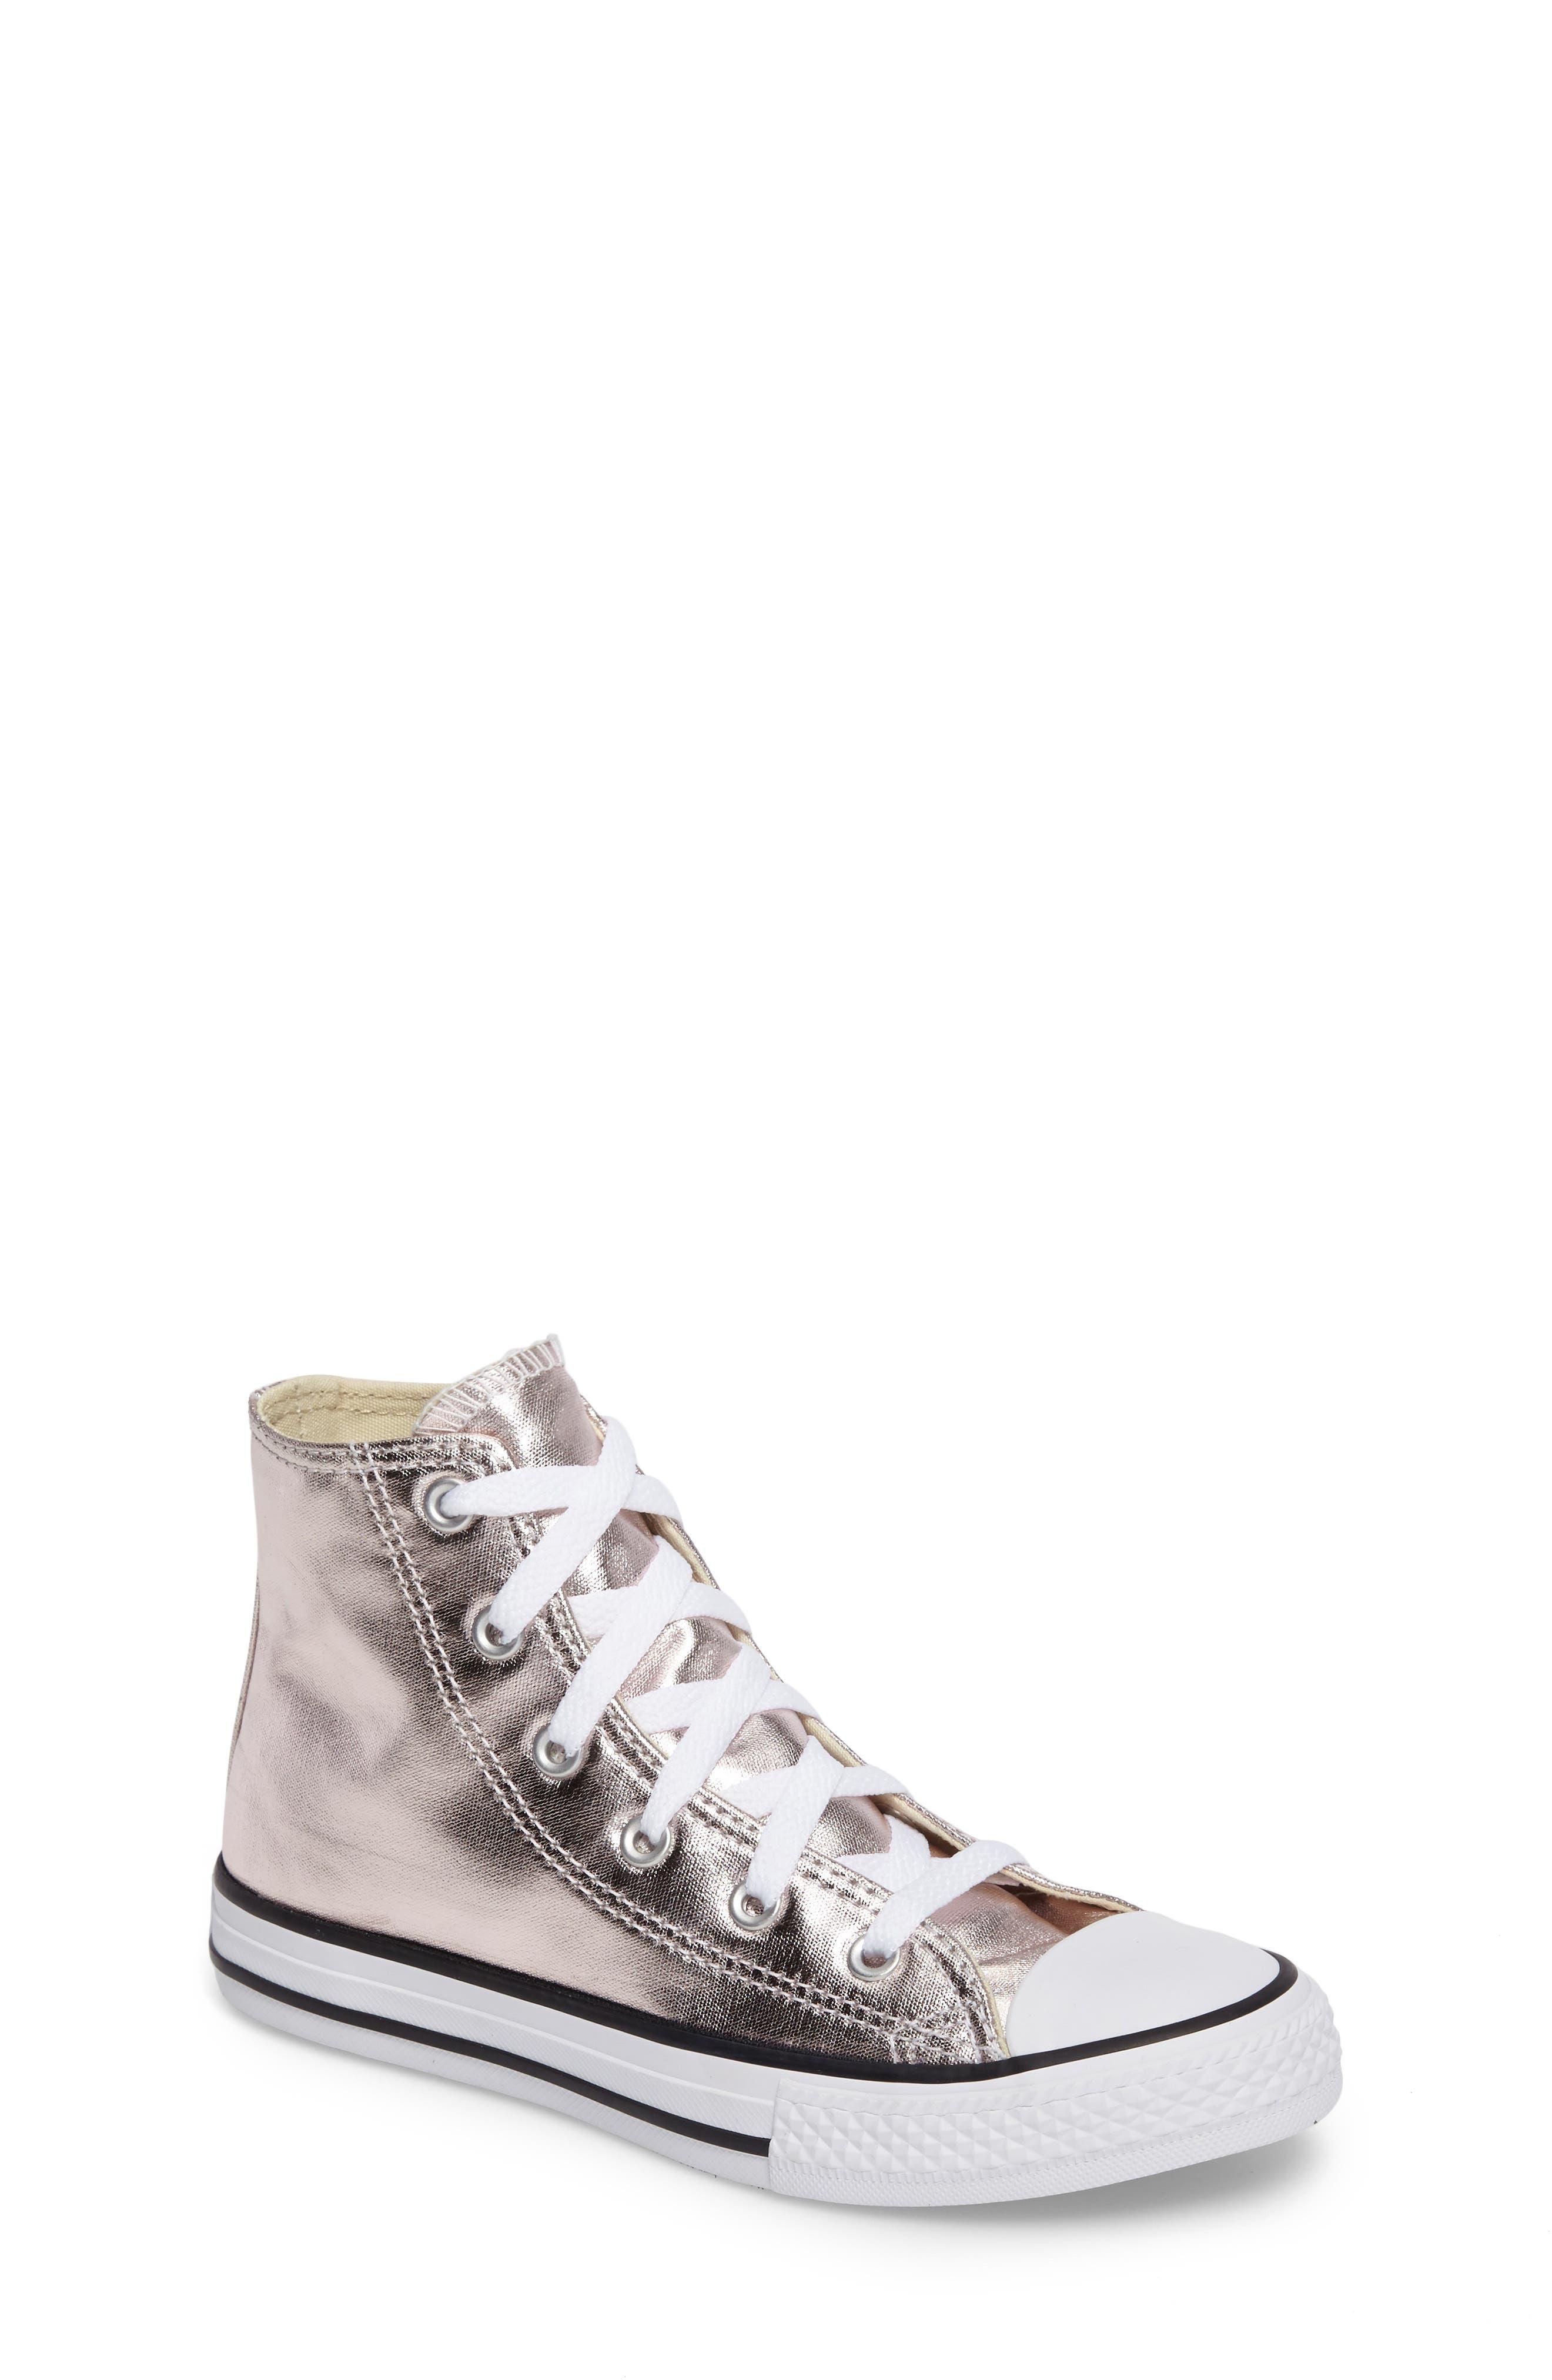 Chuck Taylor<sup>®</sup> All Star<sup>®</sup> Seasonal Metallic High Top Sneaker,                         Main,                         color, Rose Quartz/ White Canvas